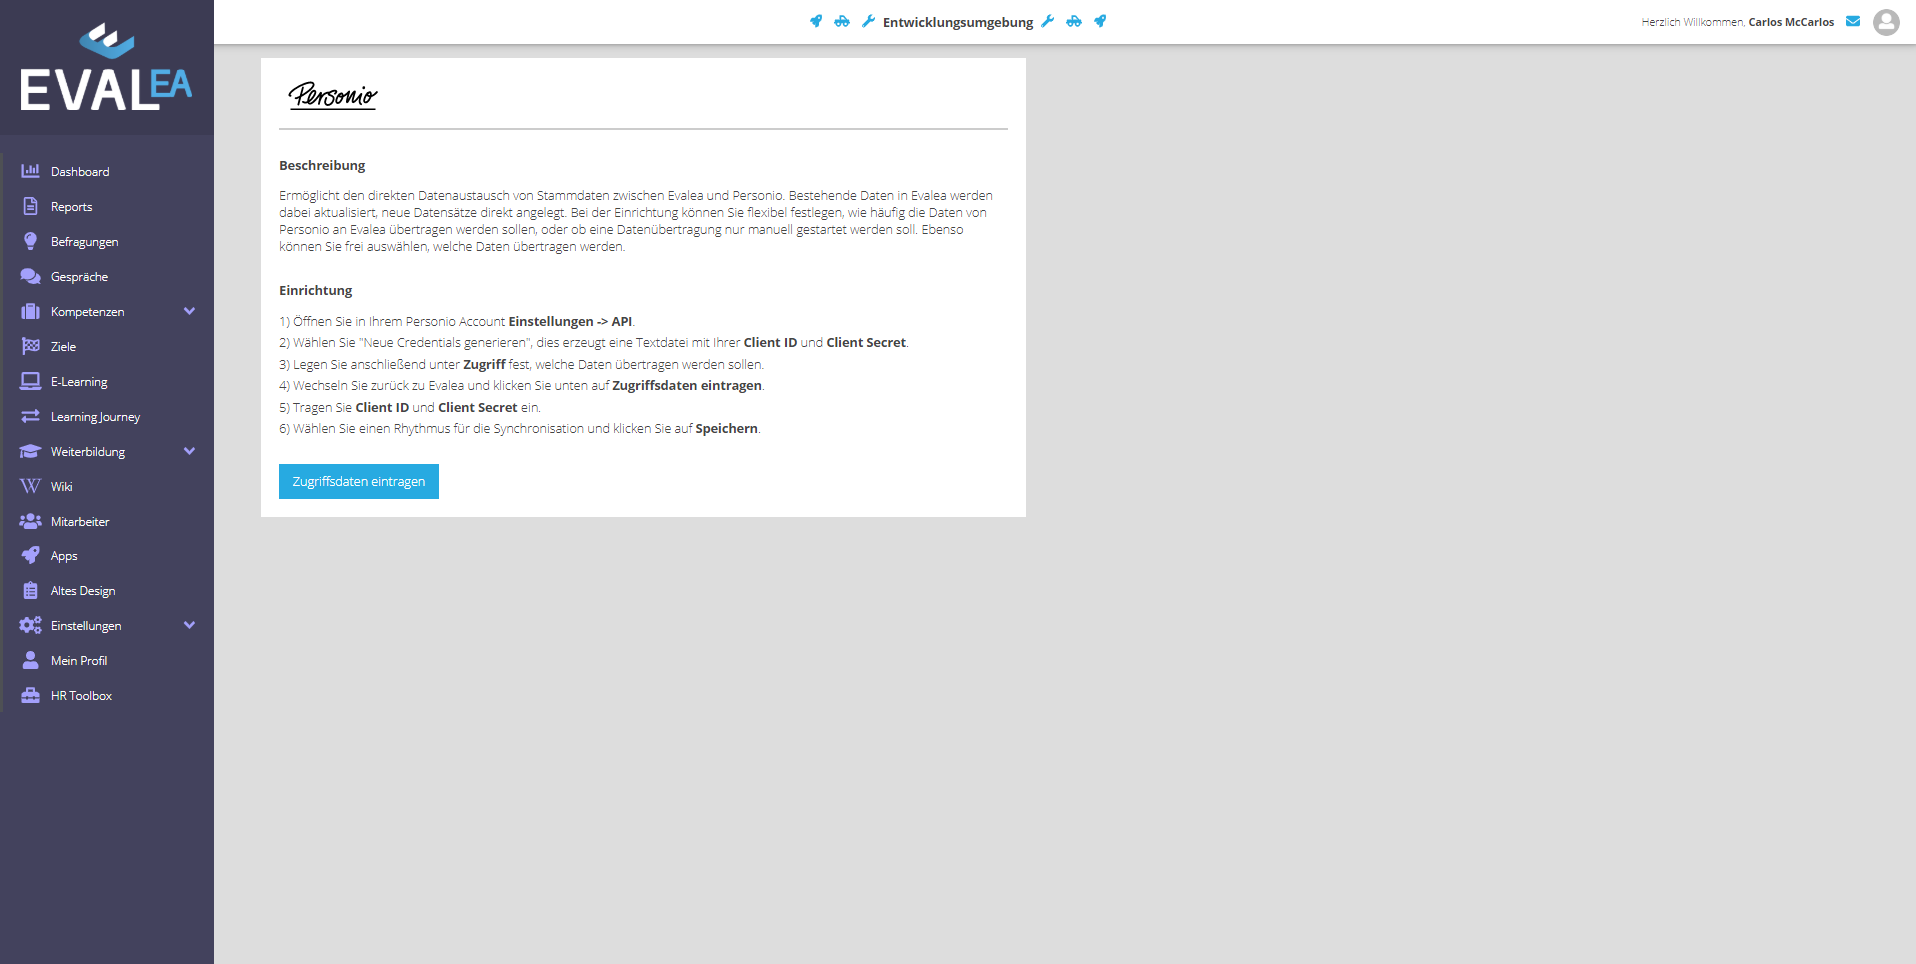 evalea-interface_de.PNG